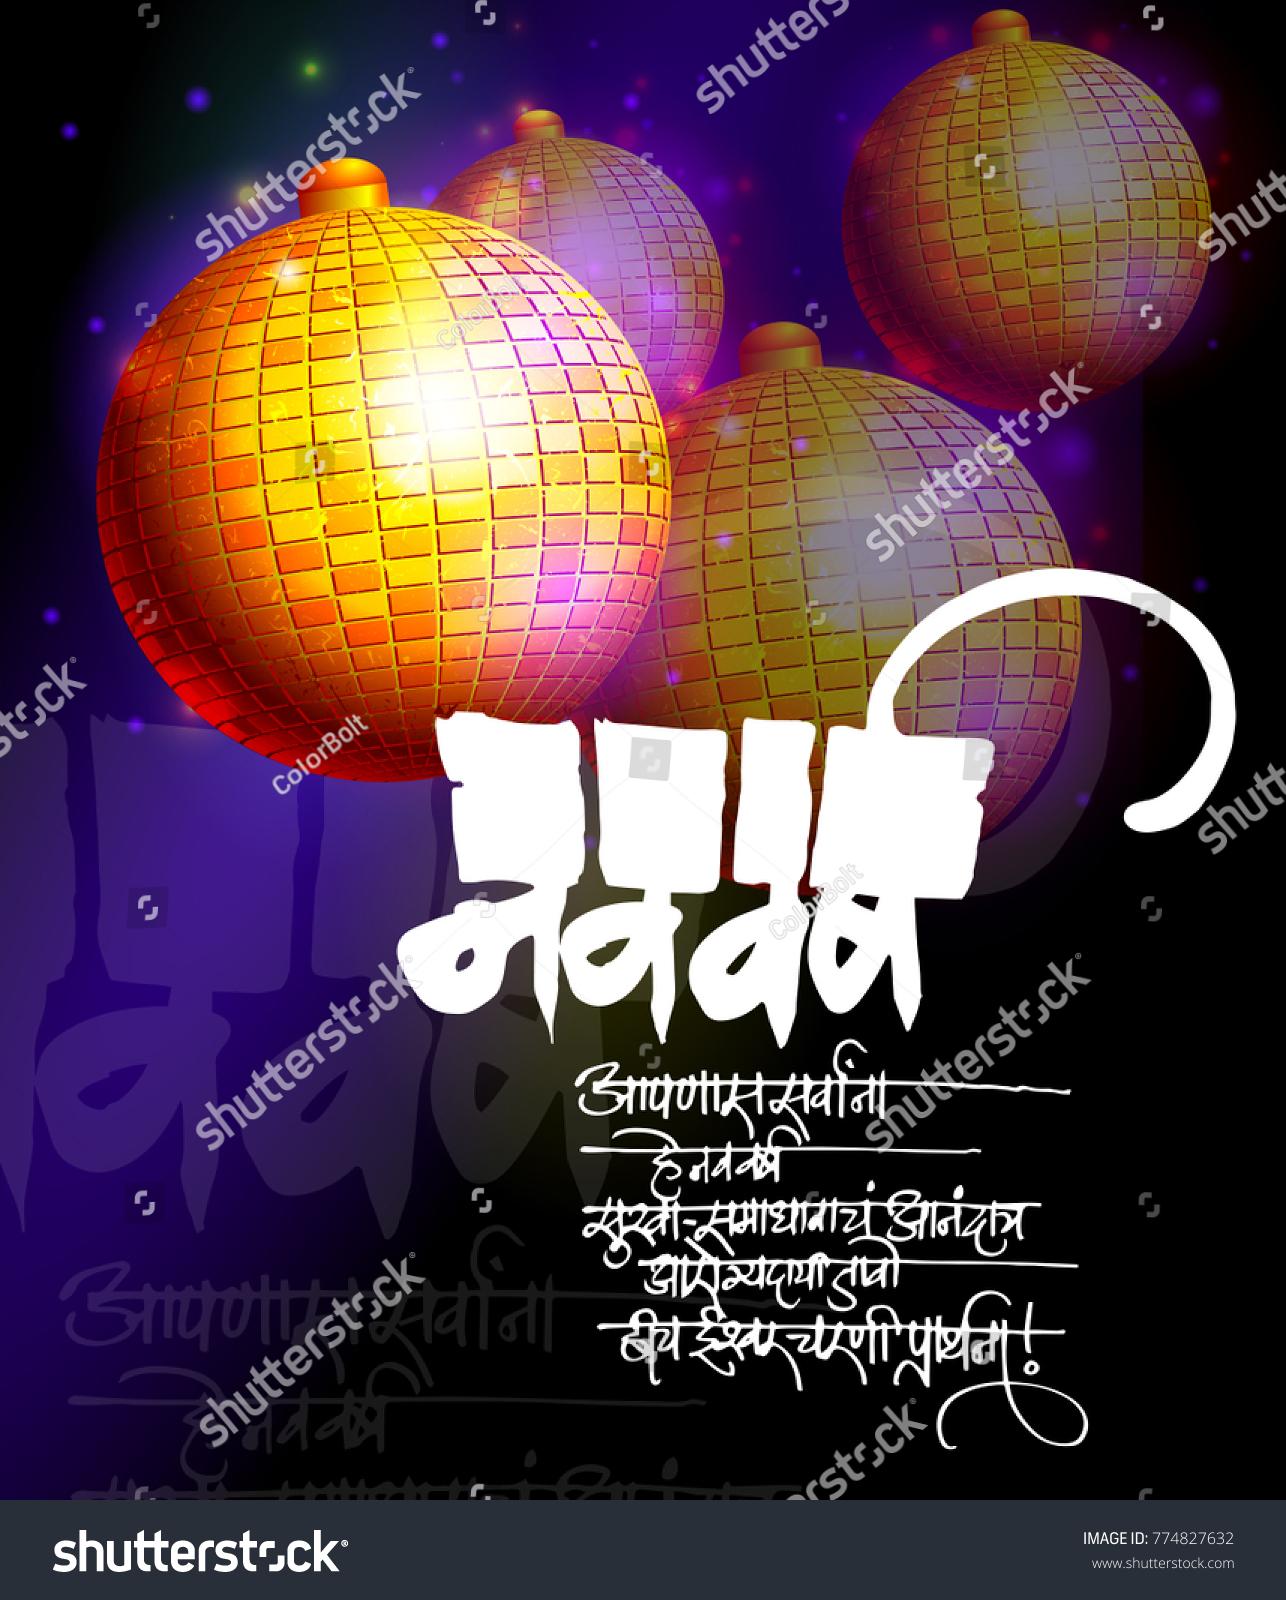 Happy New Year Wishing Hindi Text Stock Vector 774827632 Shutterstock